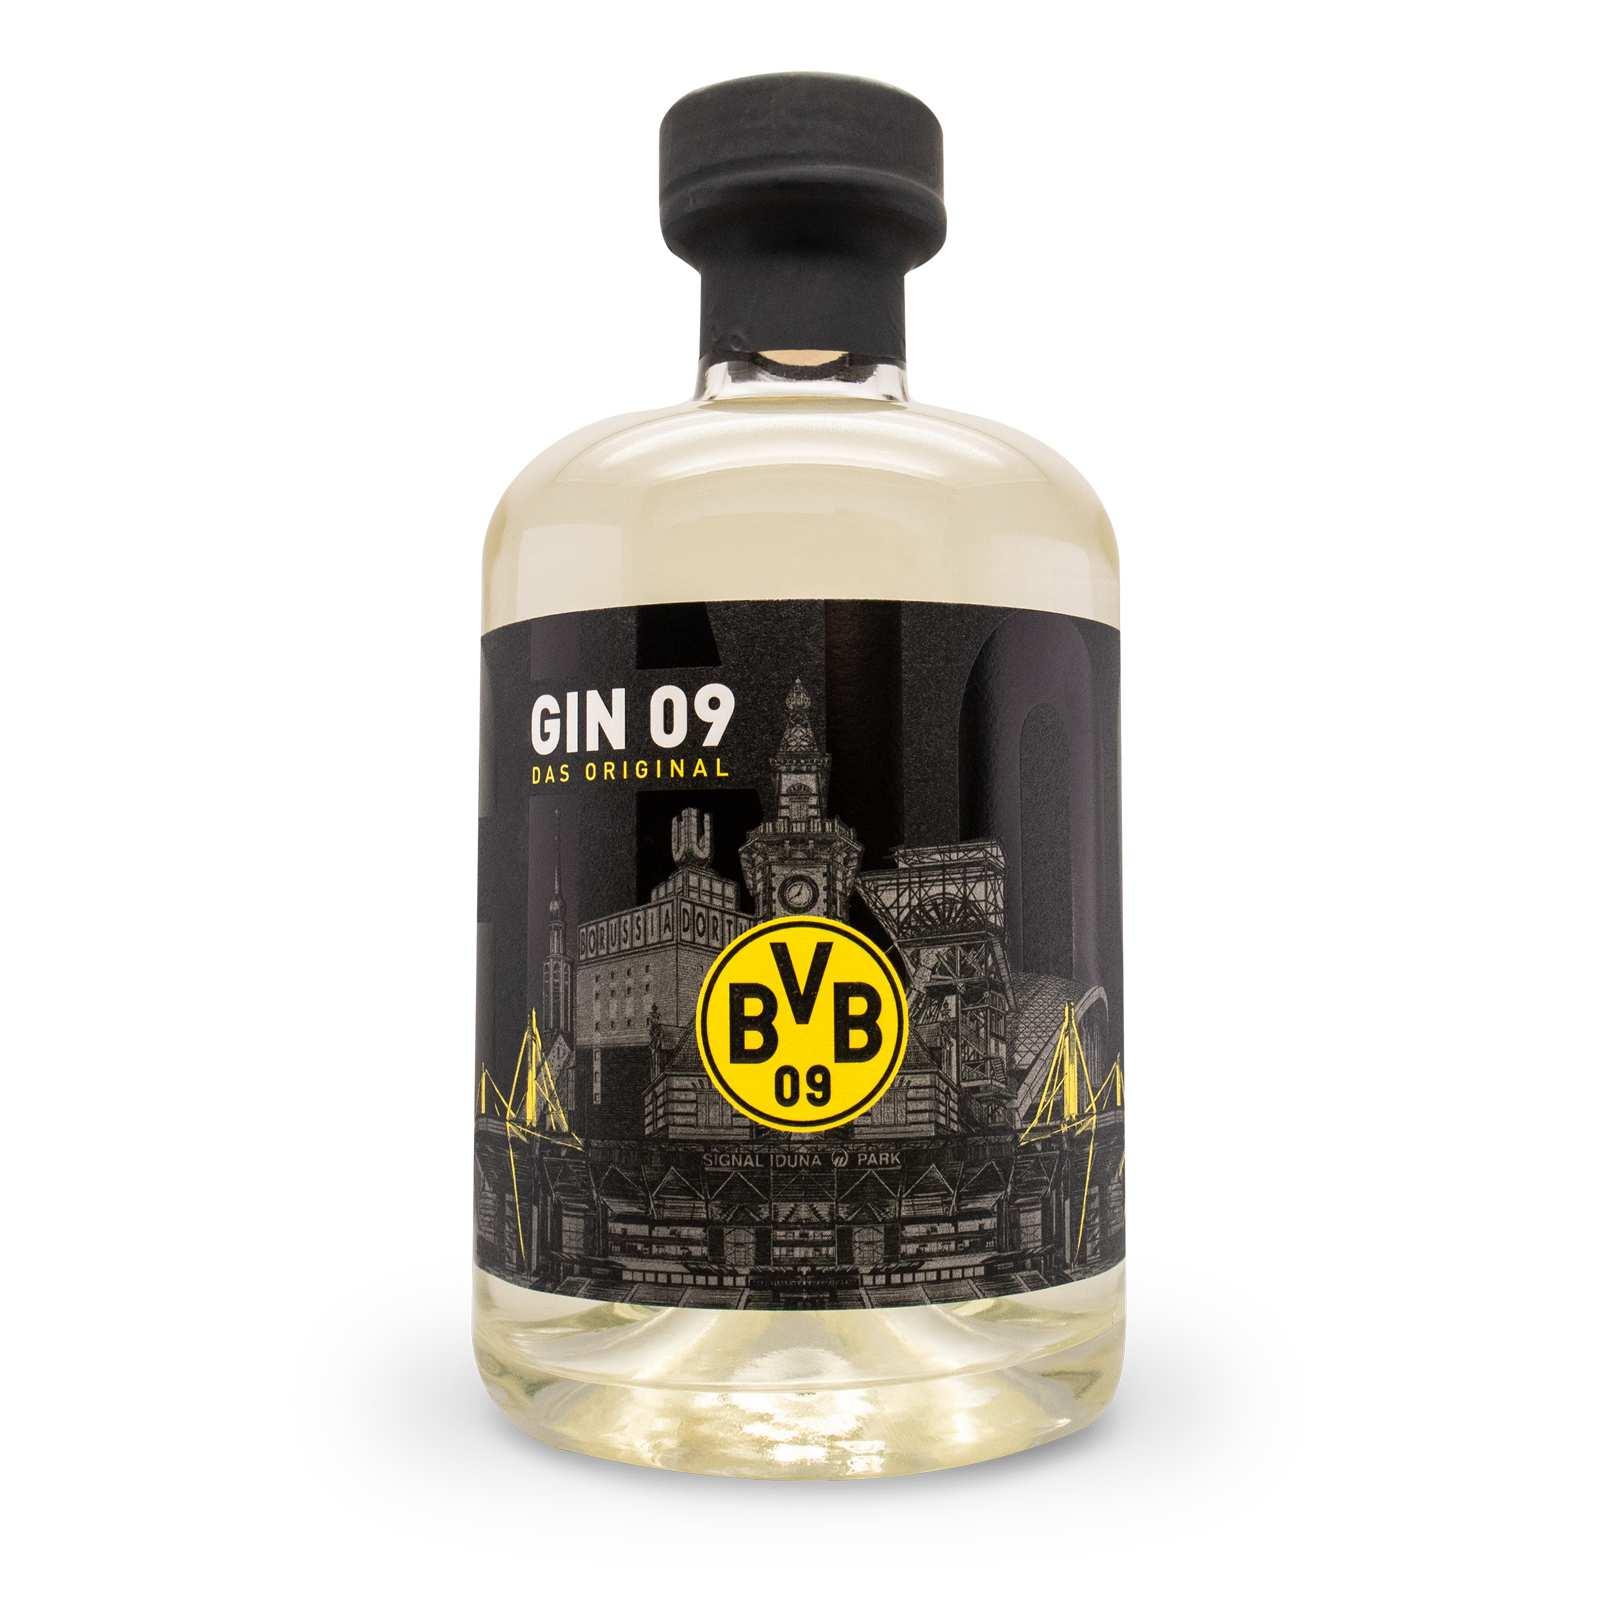 BVB-Gin 09 Borussia Dortmund ORIGINAL